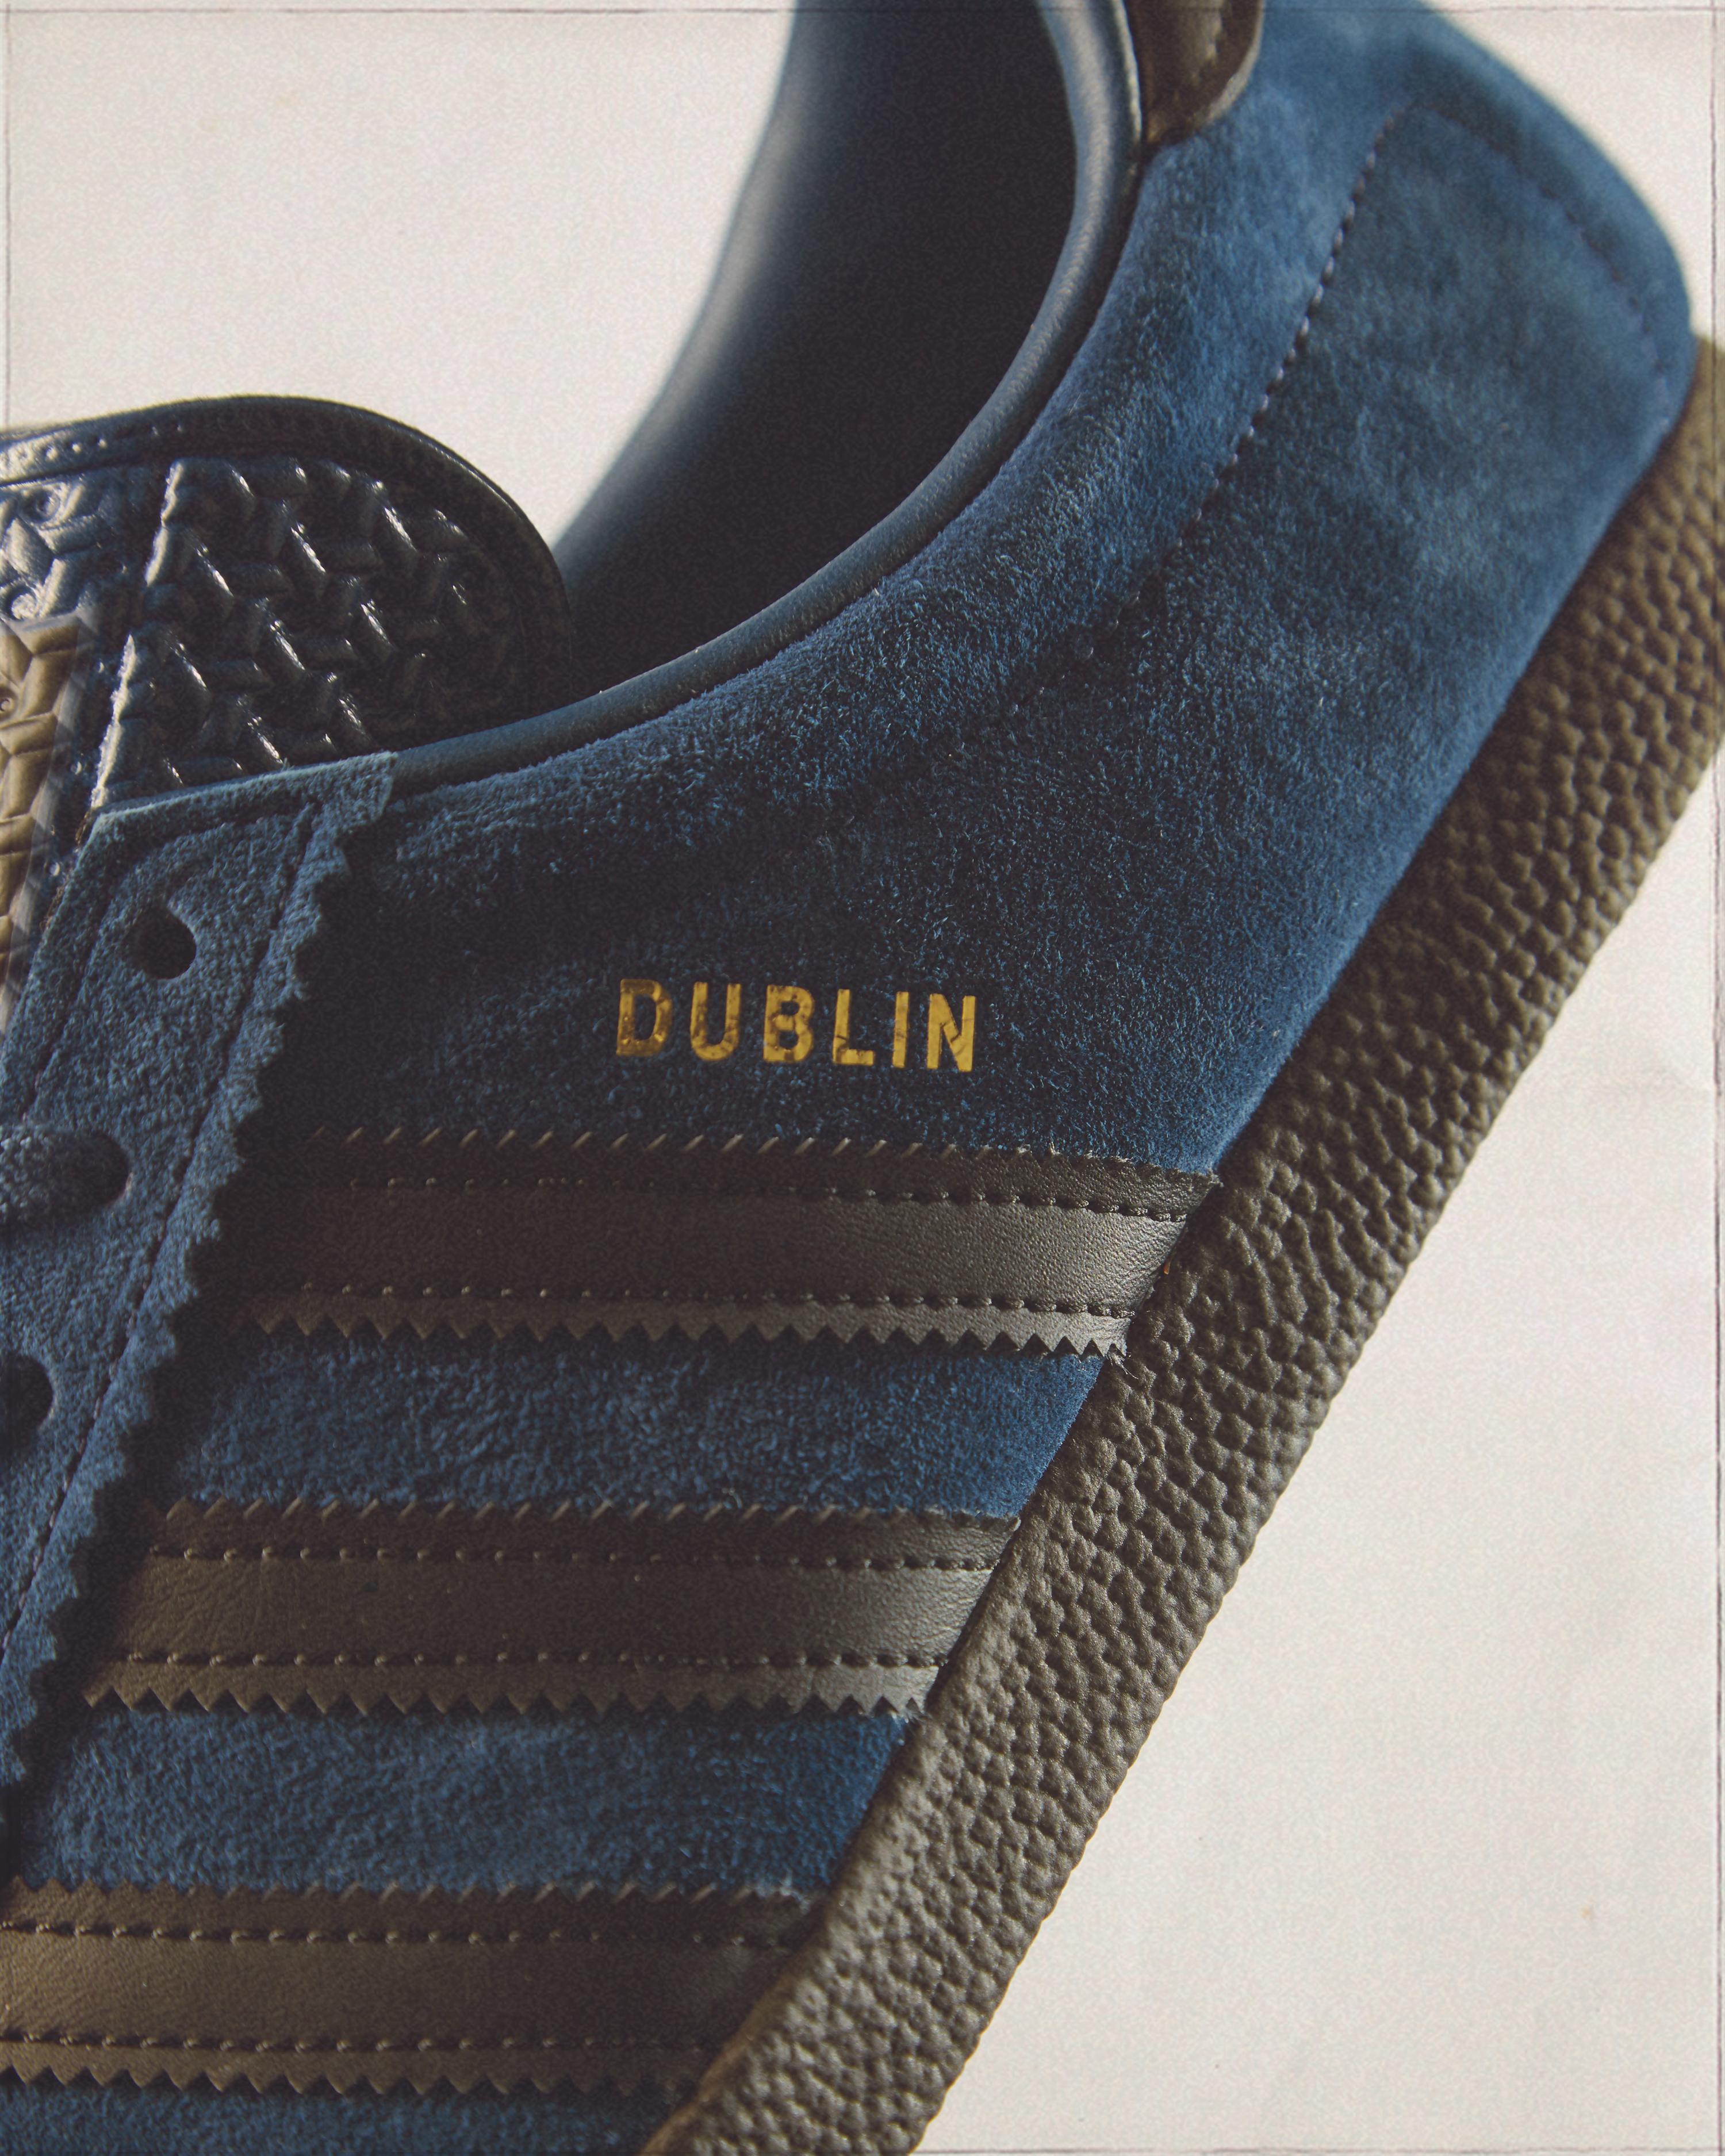 Adidas Originals Archive Dublin Taiwan Size Exclusive